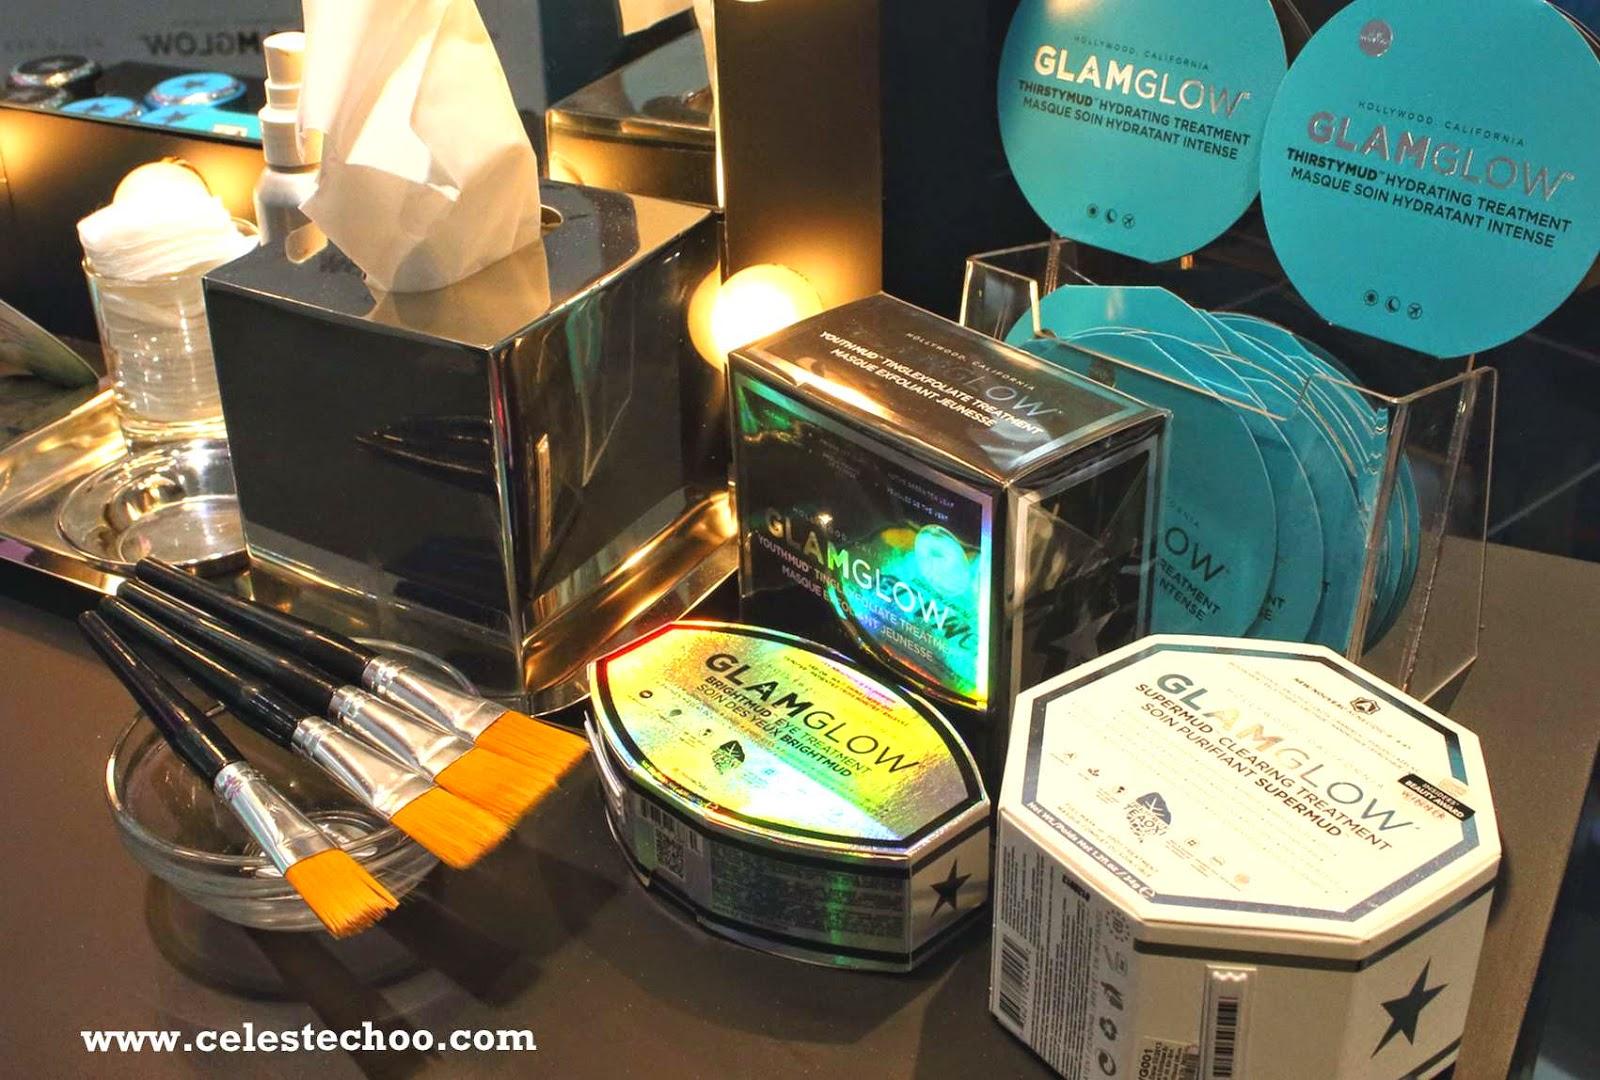 glamglow-beauty-skincare-products-sephora-malaysia